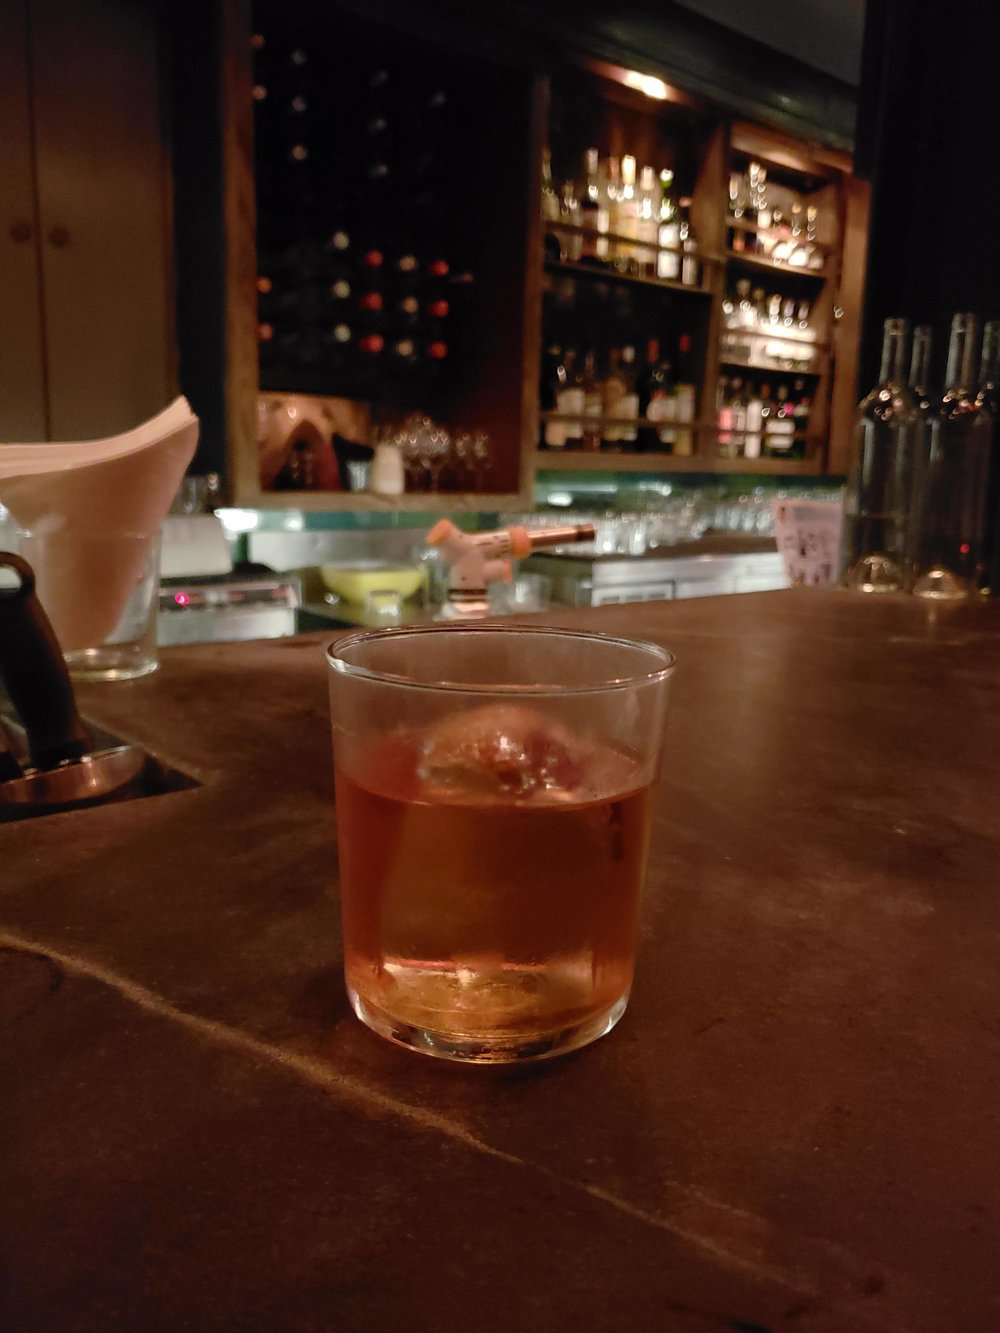 CDG - rye, cynar, vermouth, waffle liquer